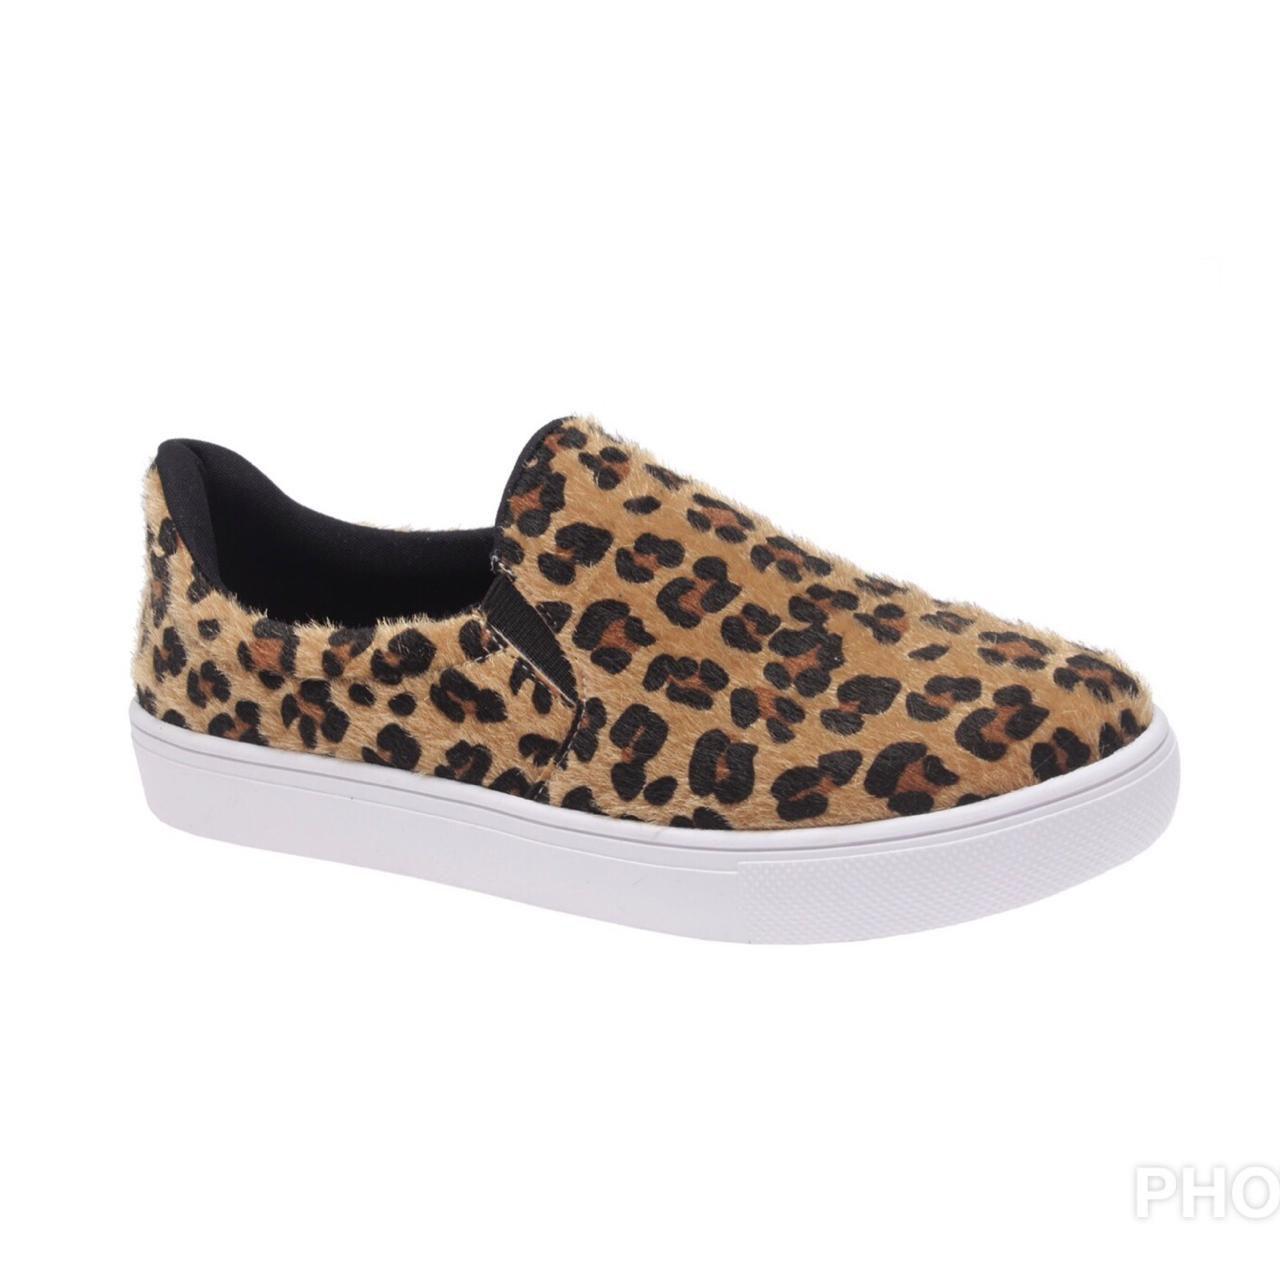 1eccea408 Tênis Animal PrintTênisAmandine Shoes